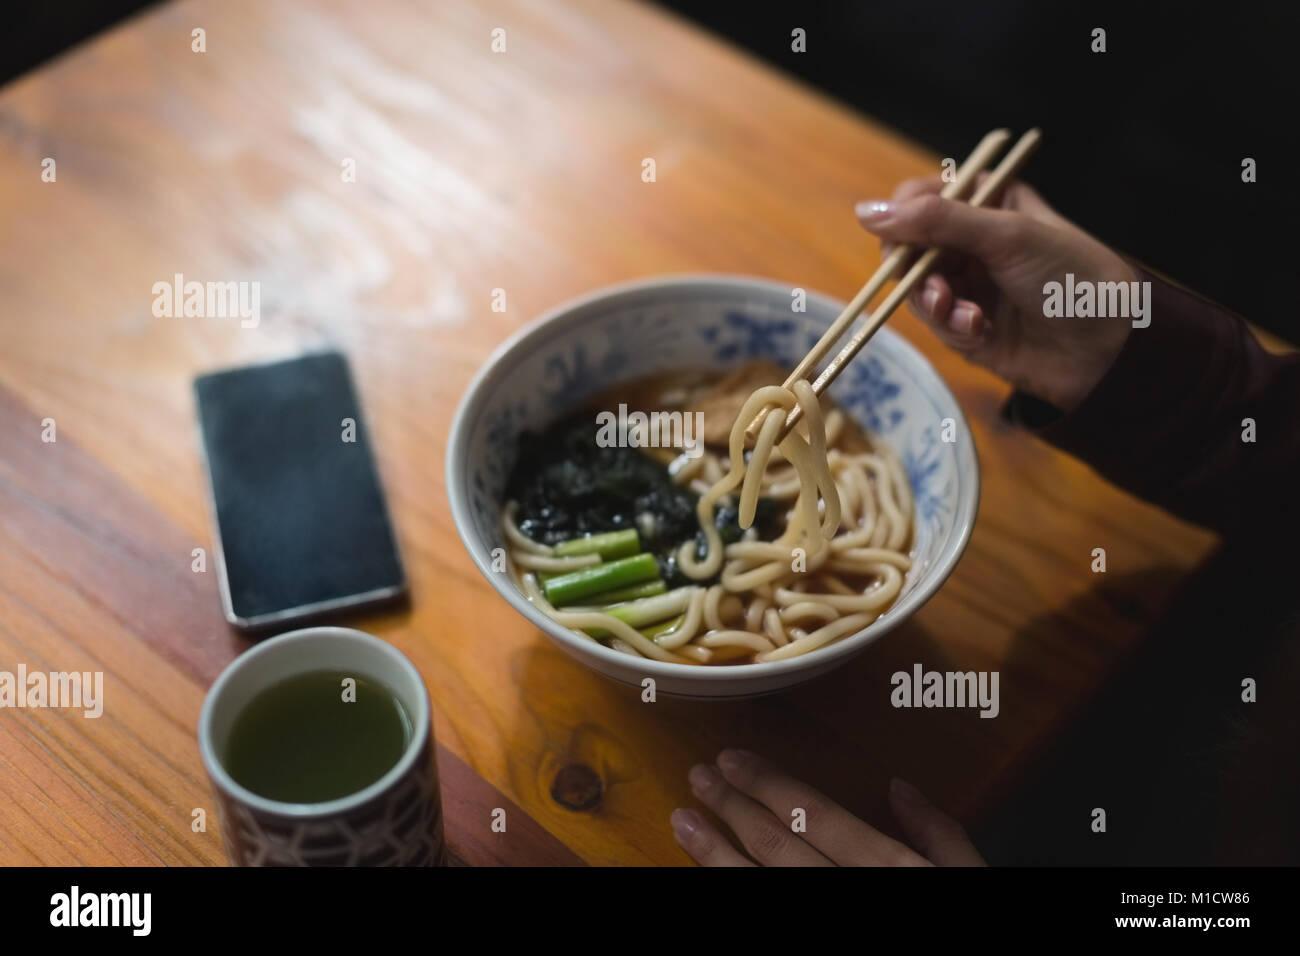 Woman having noodles in restaurant - Stock Image